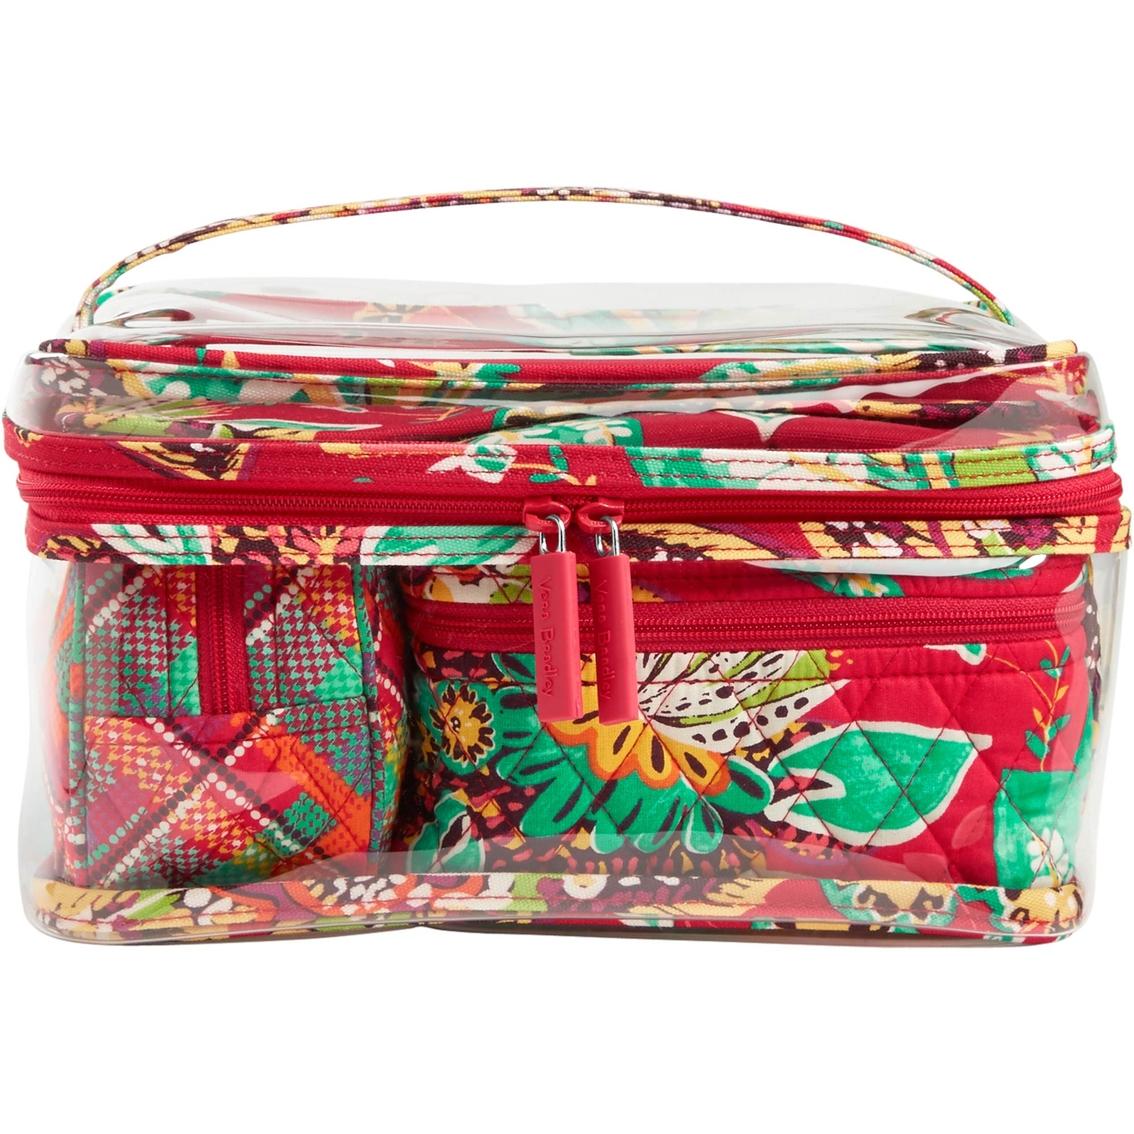 Vera Bradley Travel Cosmetic Set, Rumba